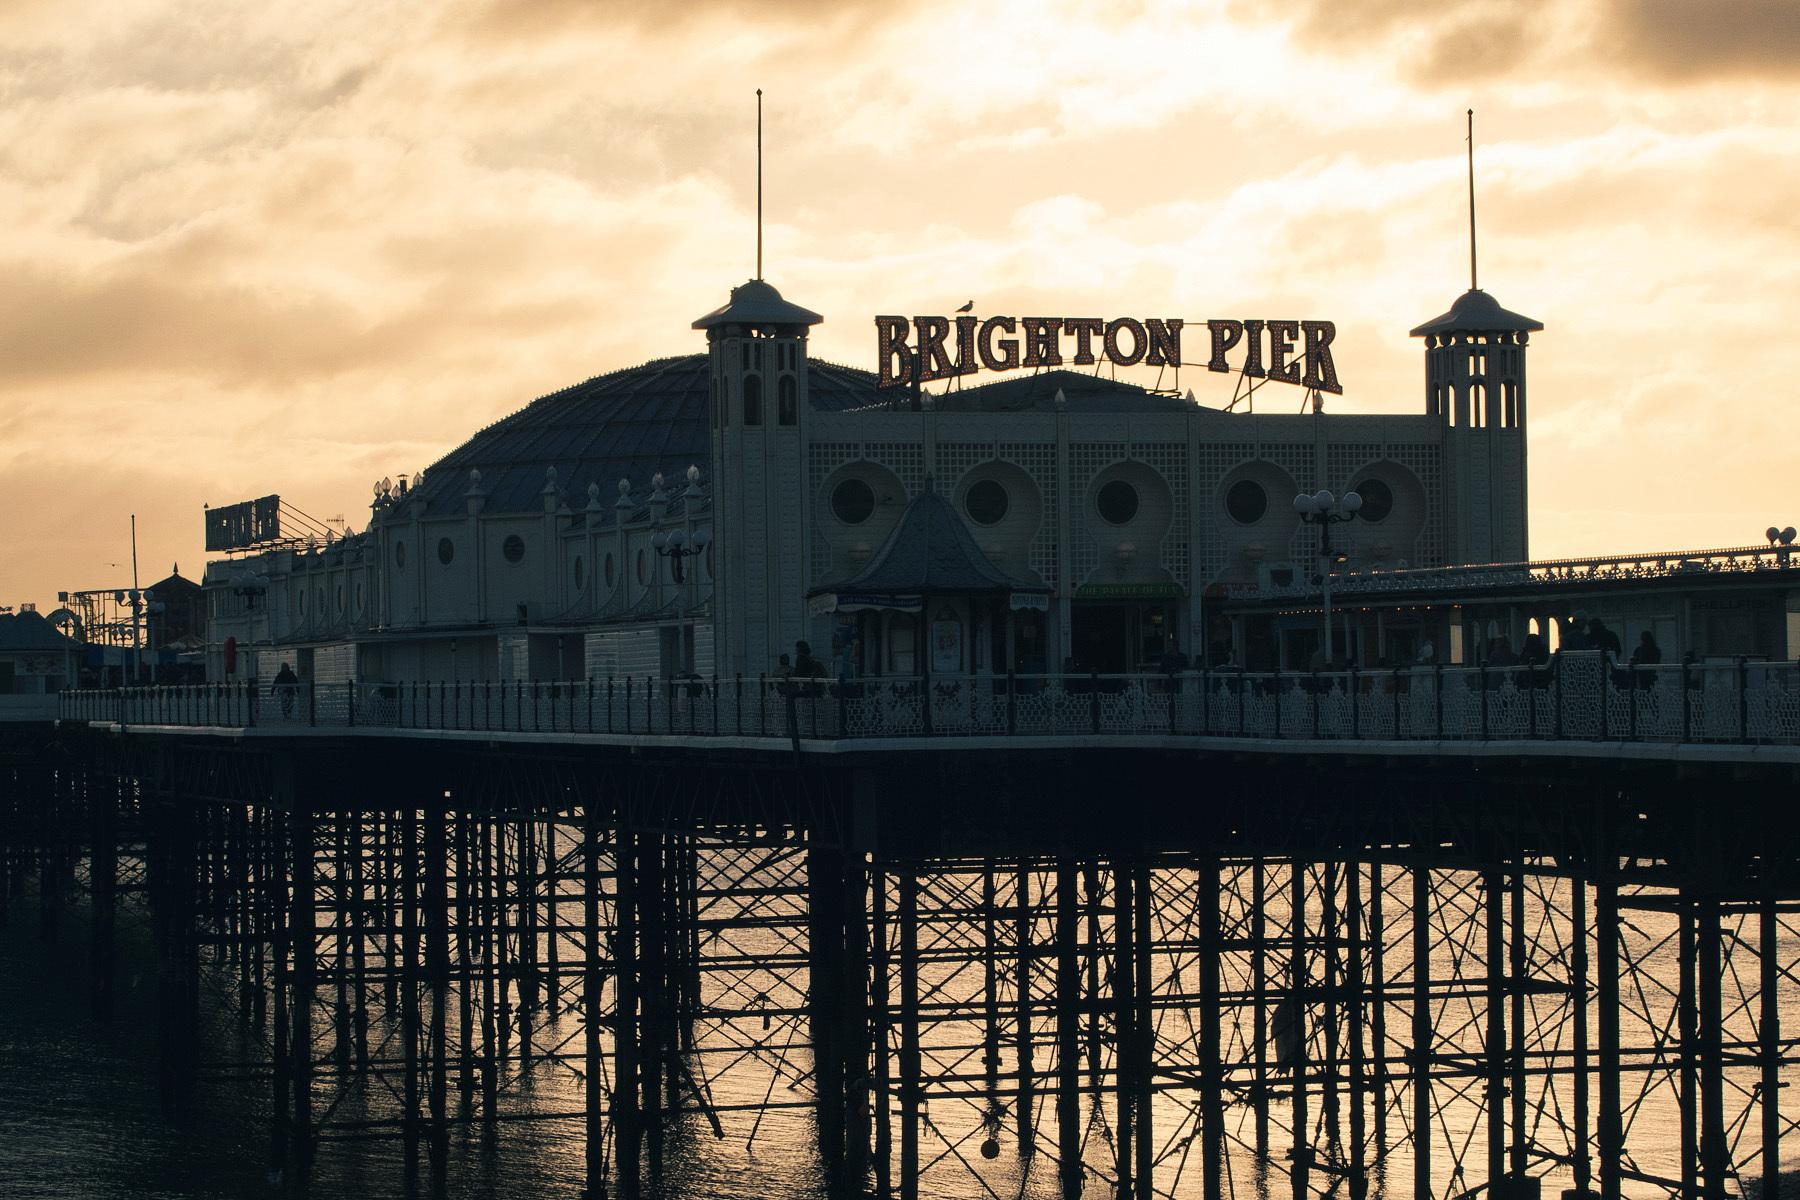 Brighton Pier, Brighton, East Sussex, England